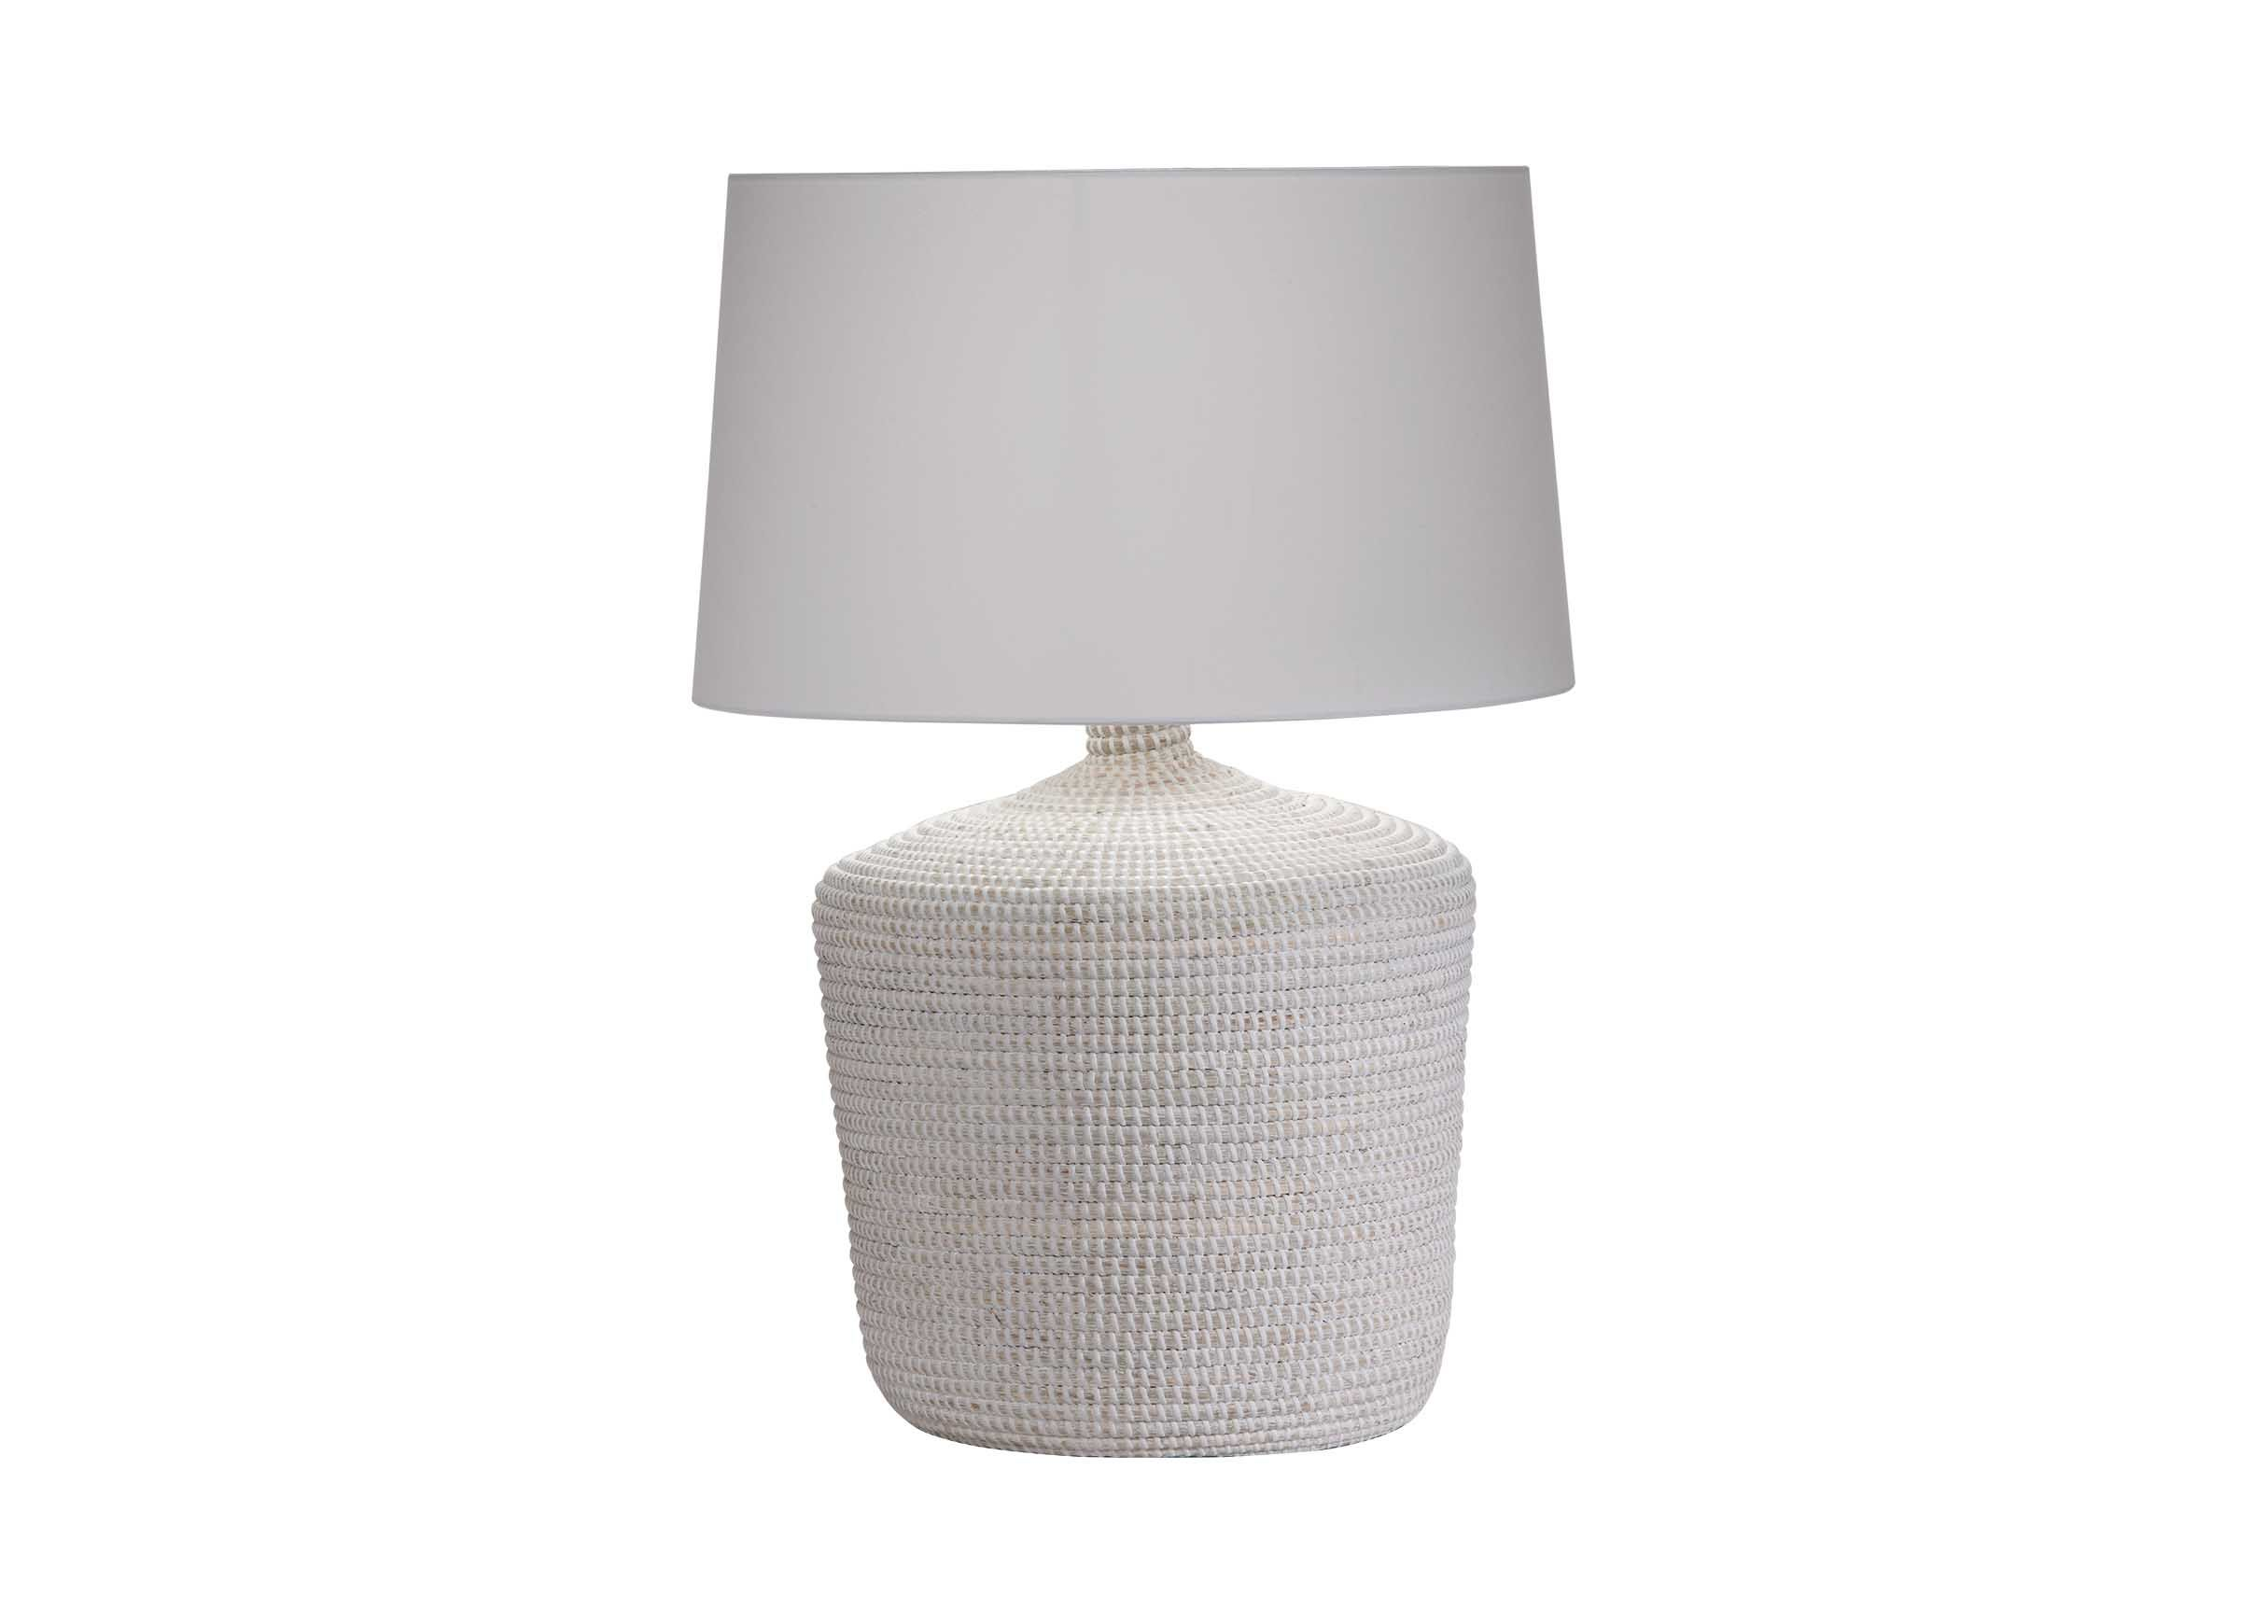 Seneca Woven Table Lamp TABLE LAMPS Ethan Allen Lamp